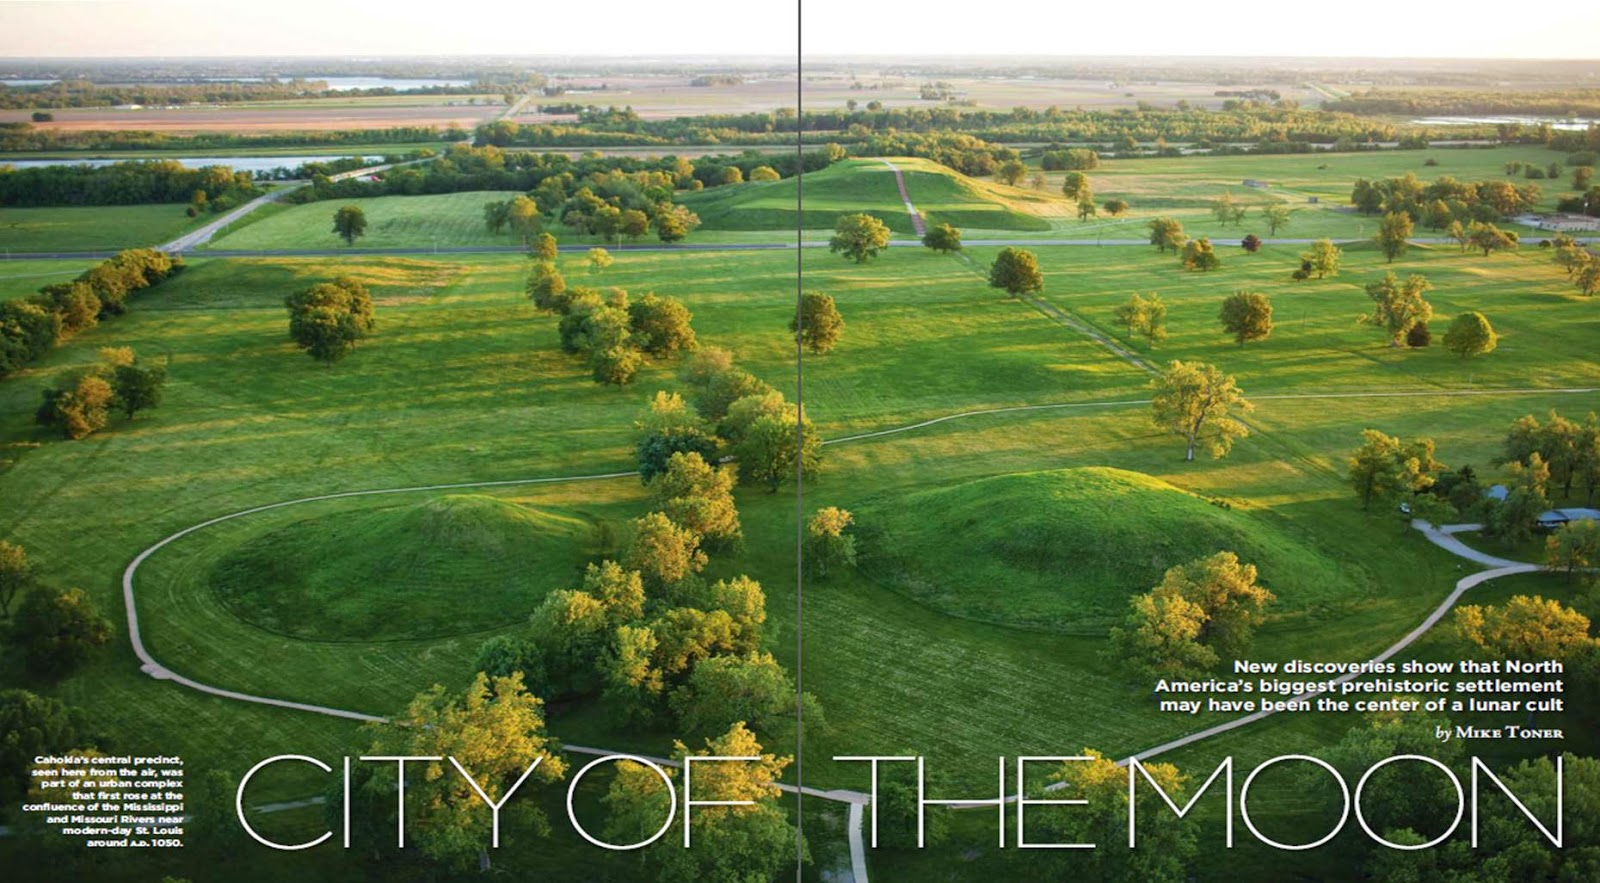 Archaeology Magazine March/April 2015. City of the Moon. Mike Toner. Image Courtesy of Archaeology Magazine.